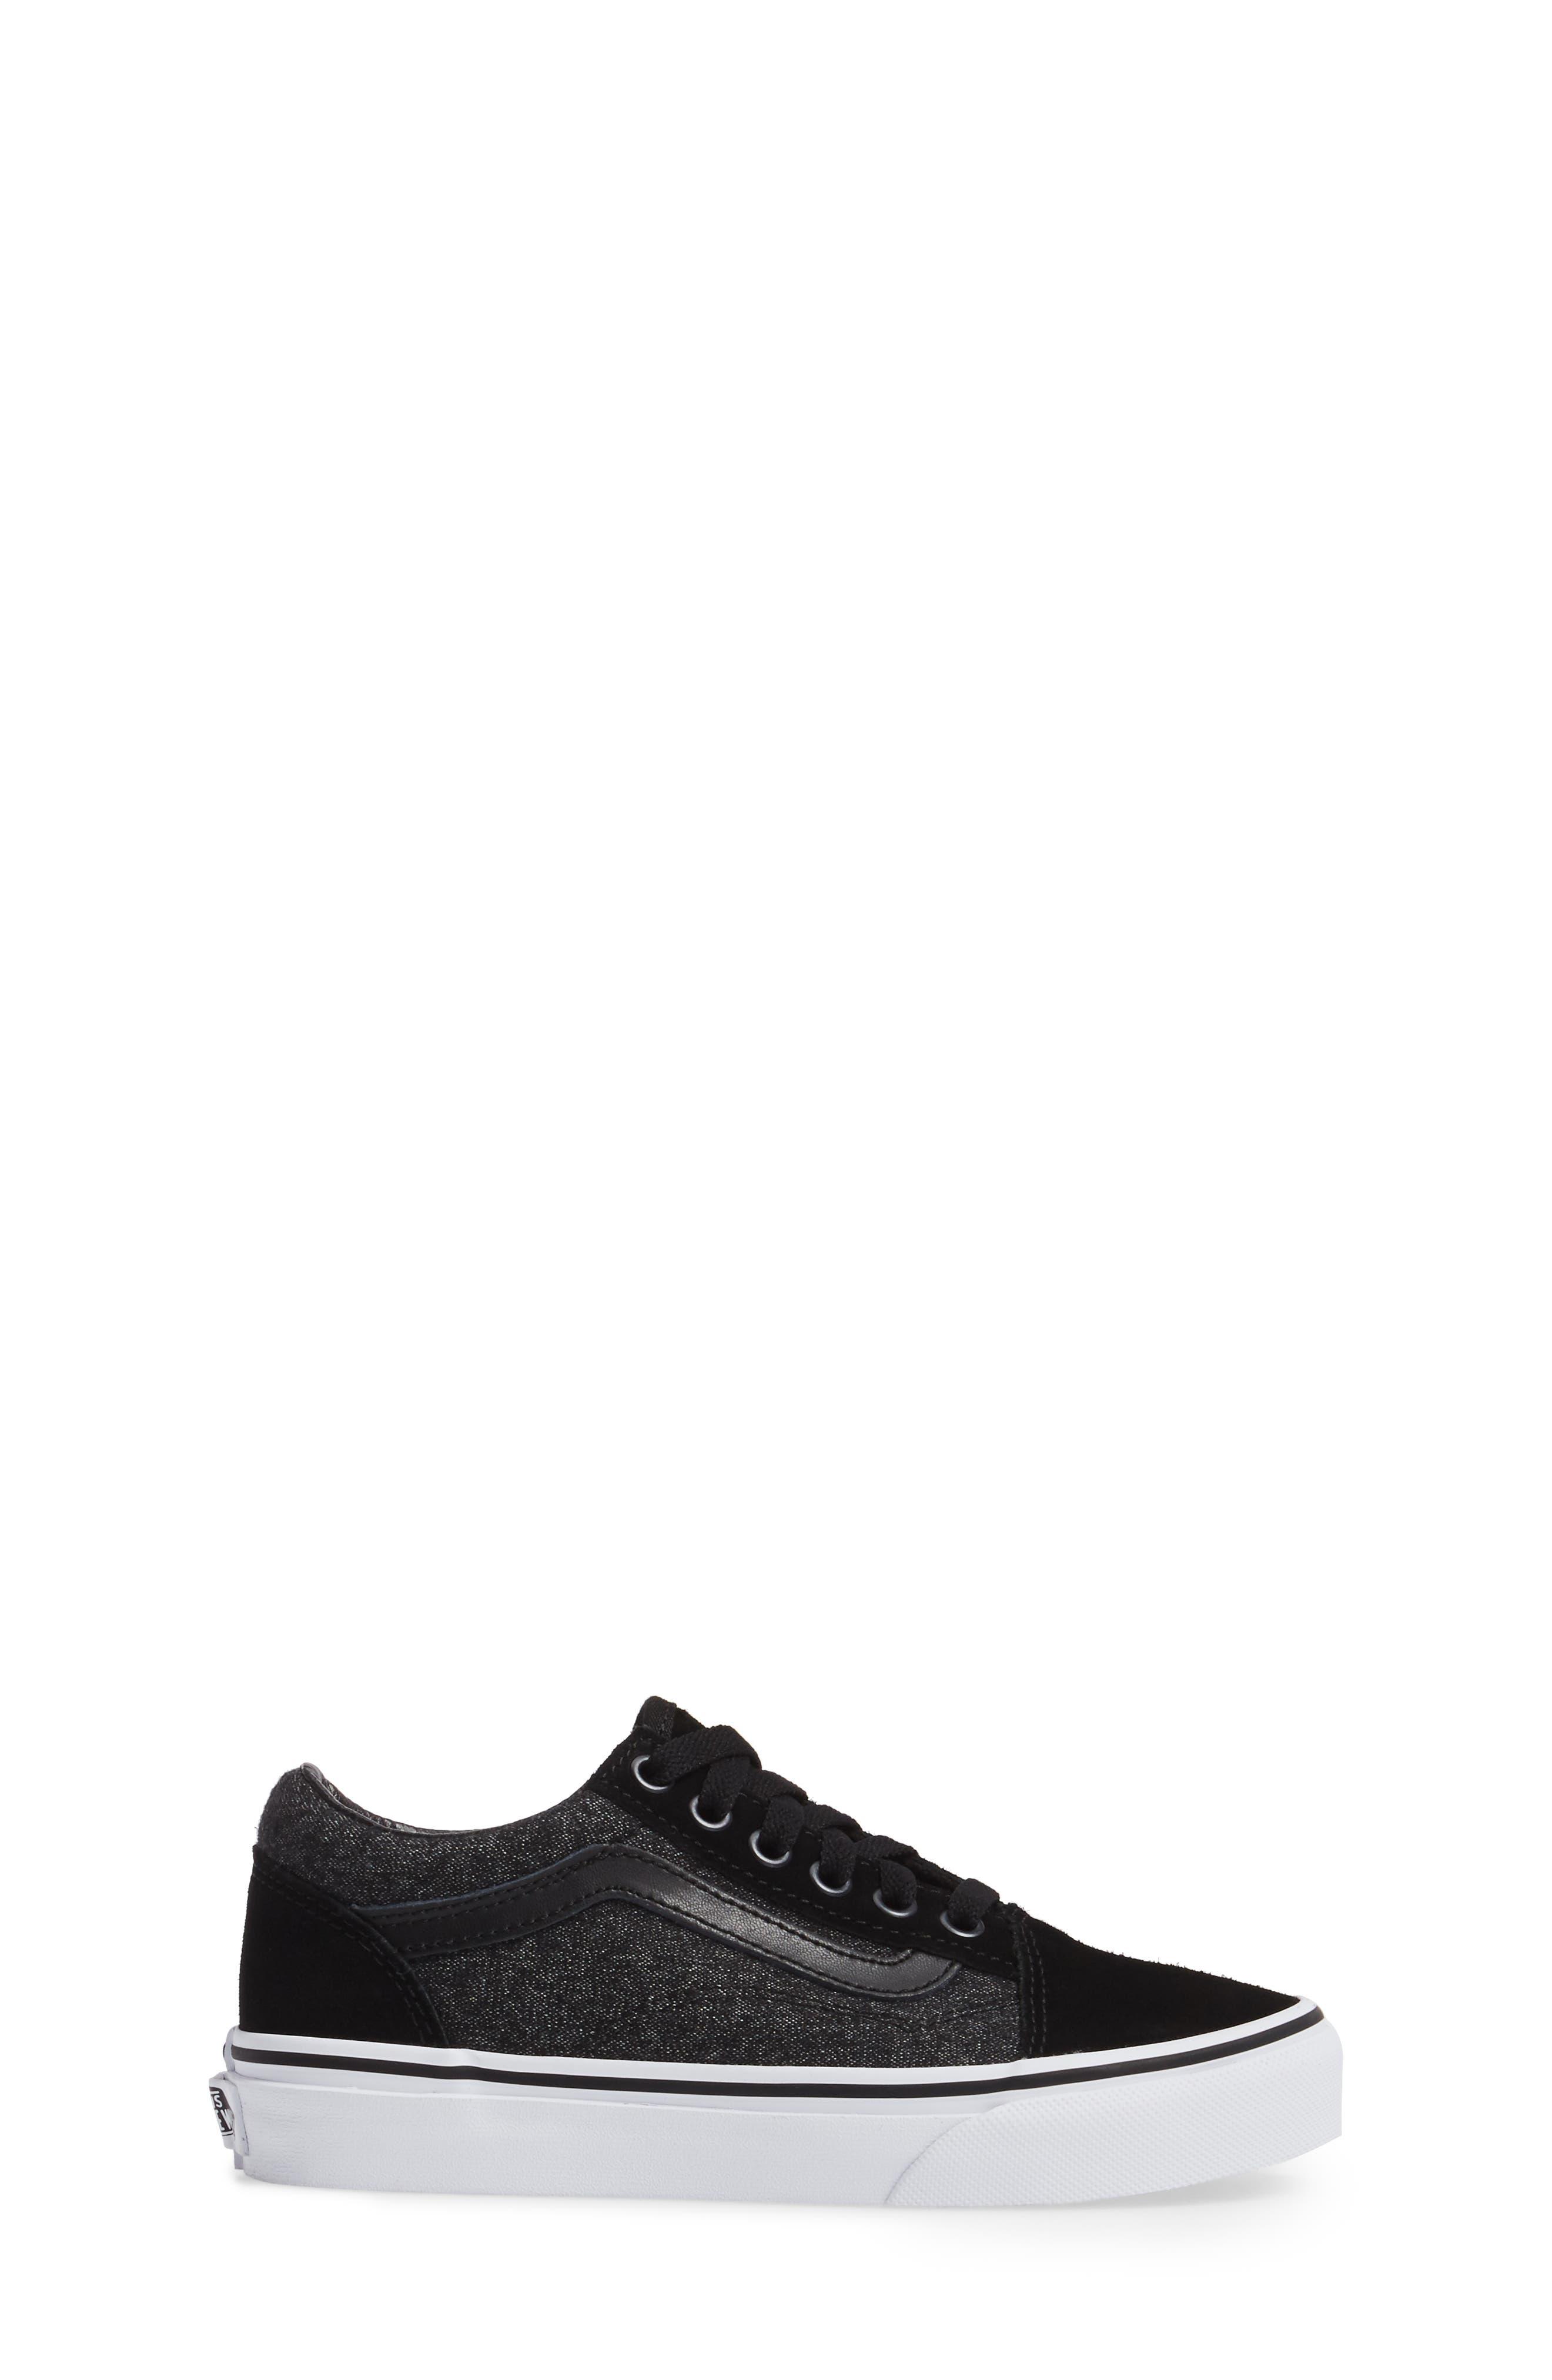 Old Skool Sneaker,                             Alternate thumbnail 3, color,                             001